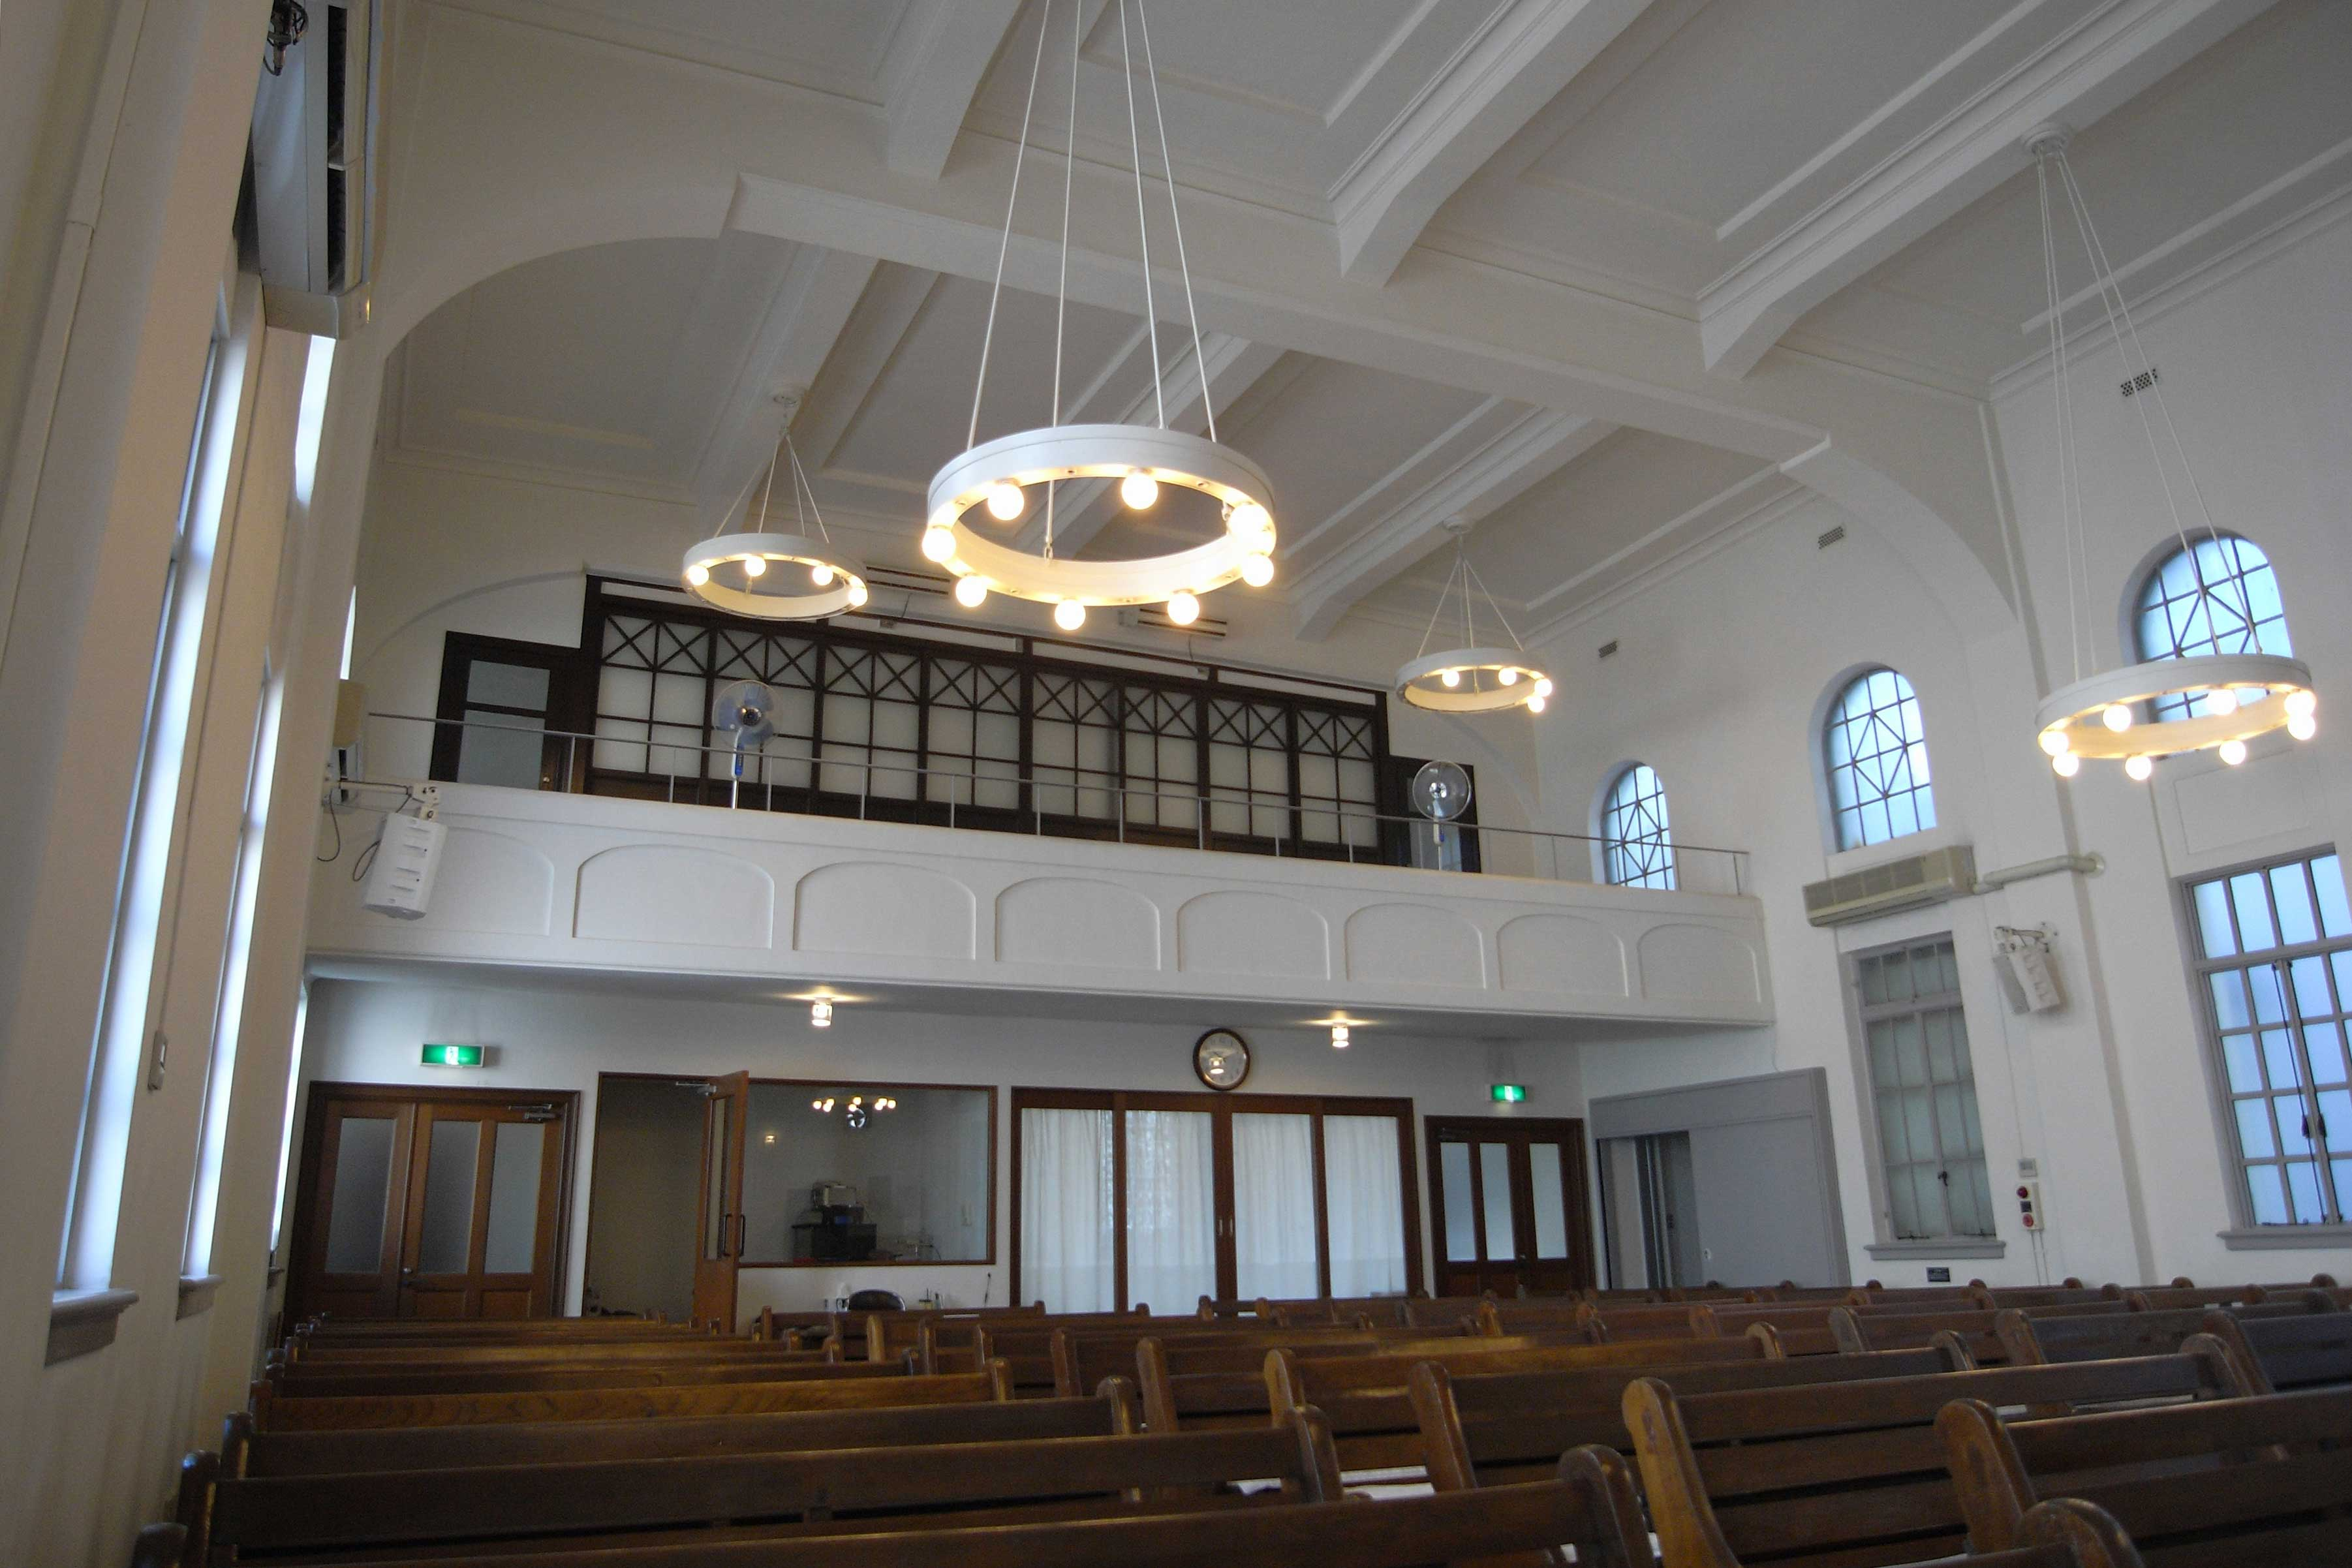 <p>内部礼拝室(看後方入口)</p>竣工時、上層座席後部有畳部屋。